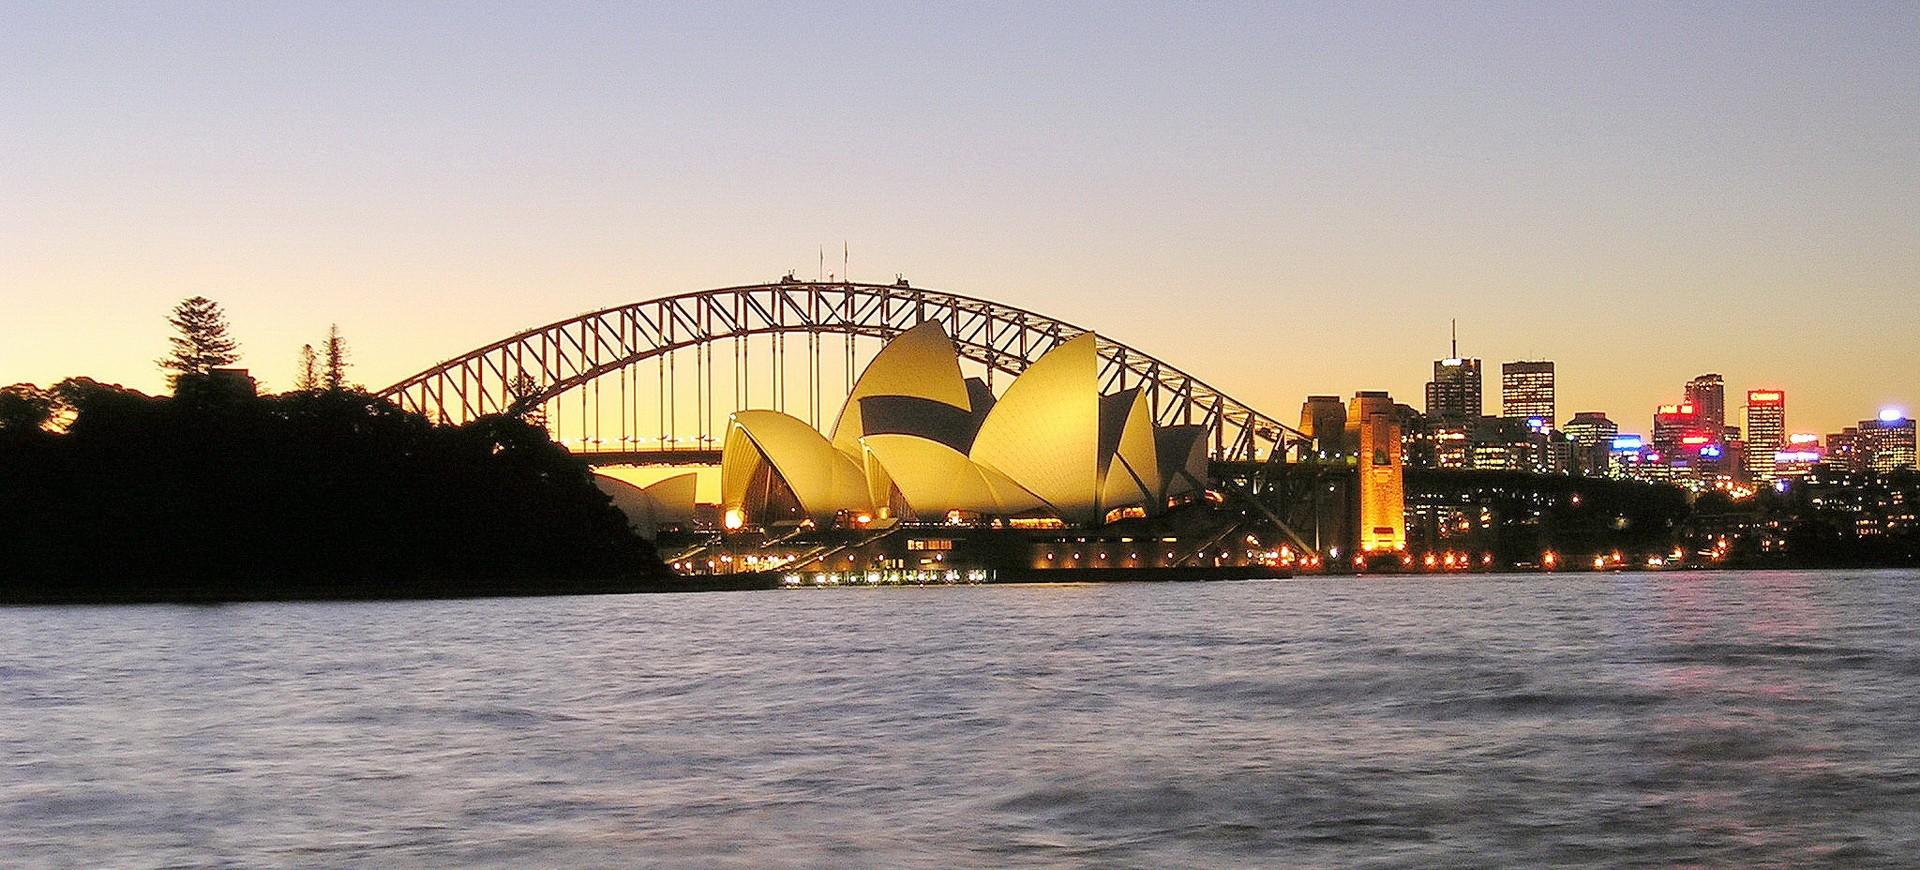 Australie Sydney Bridge